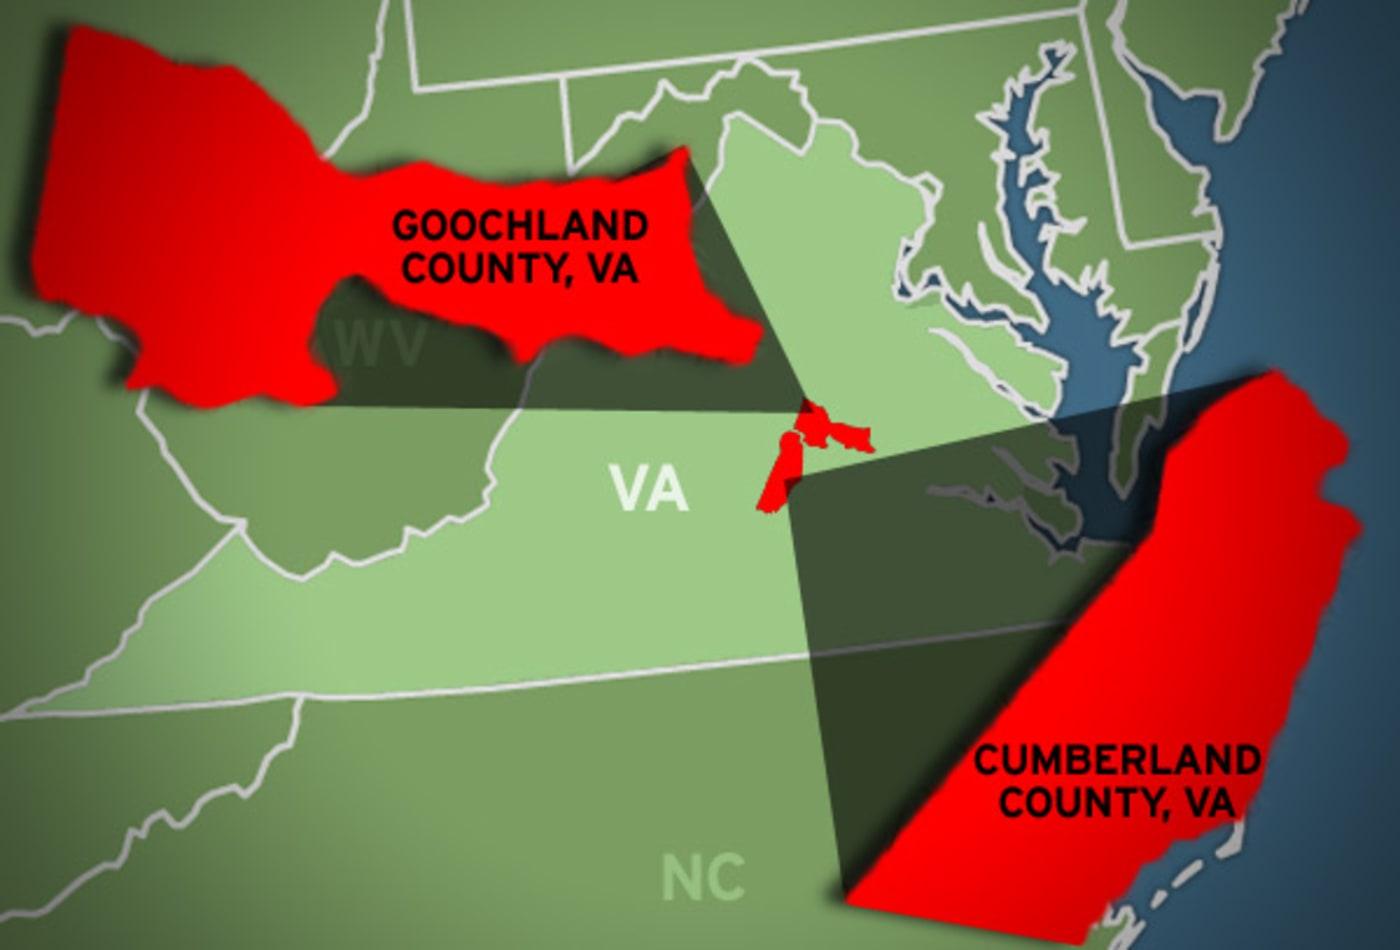 americas_biggest-wealth-gap-county_to_county_slide_3.jpg